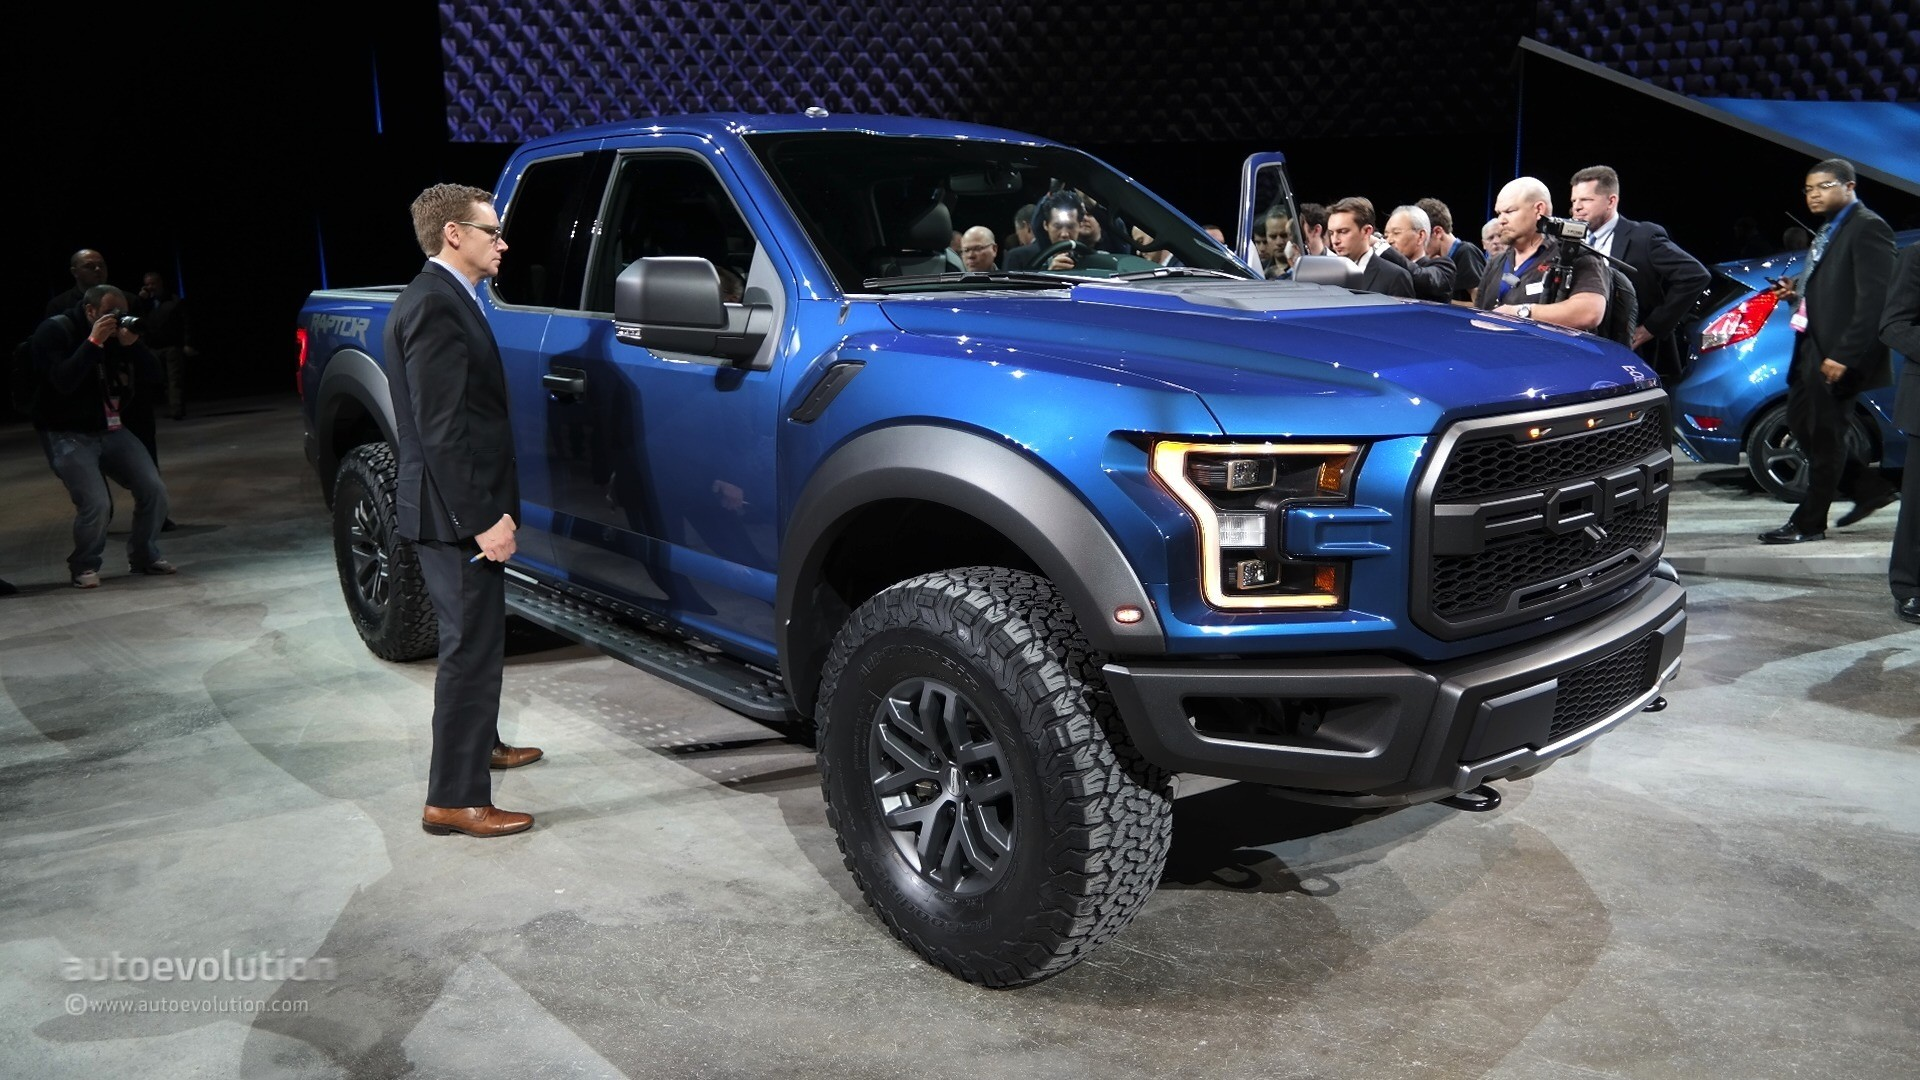 2017 ford f 150 raptor confirmed with 450 hp 510 lb ft autoevolution. Black Bedroom Furniture Sets. Home Design Ideas